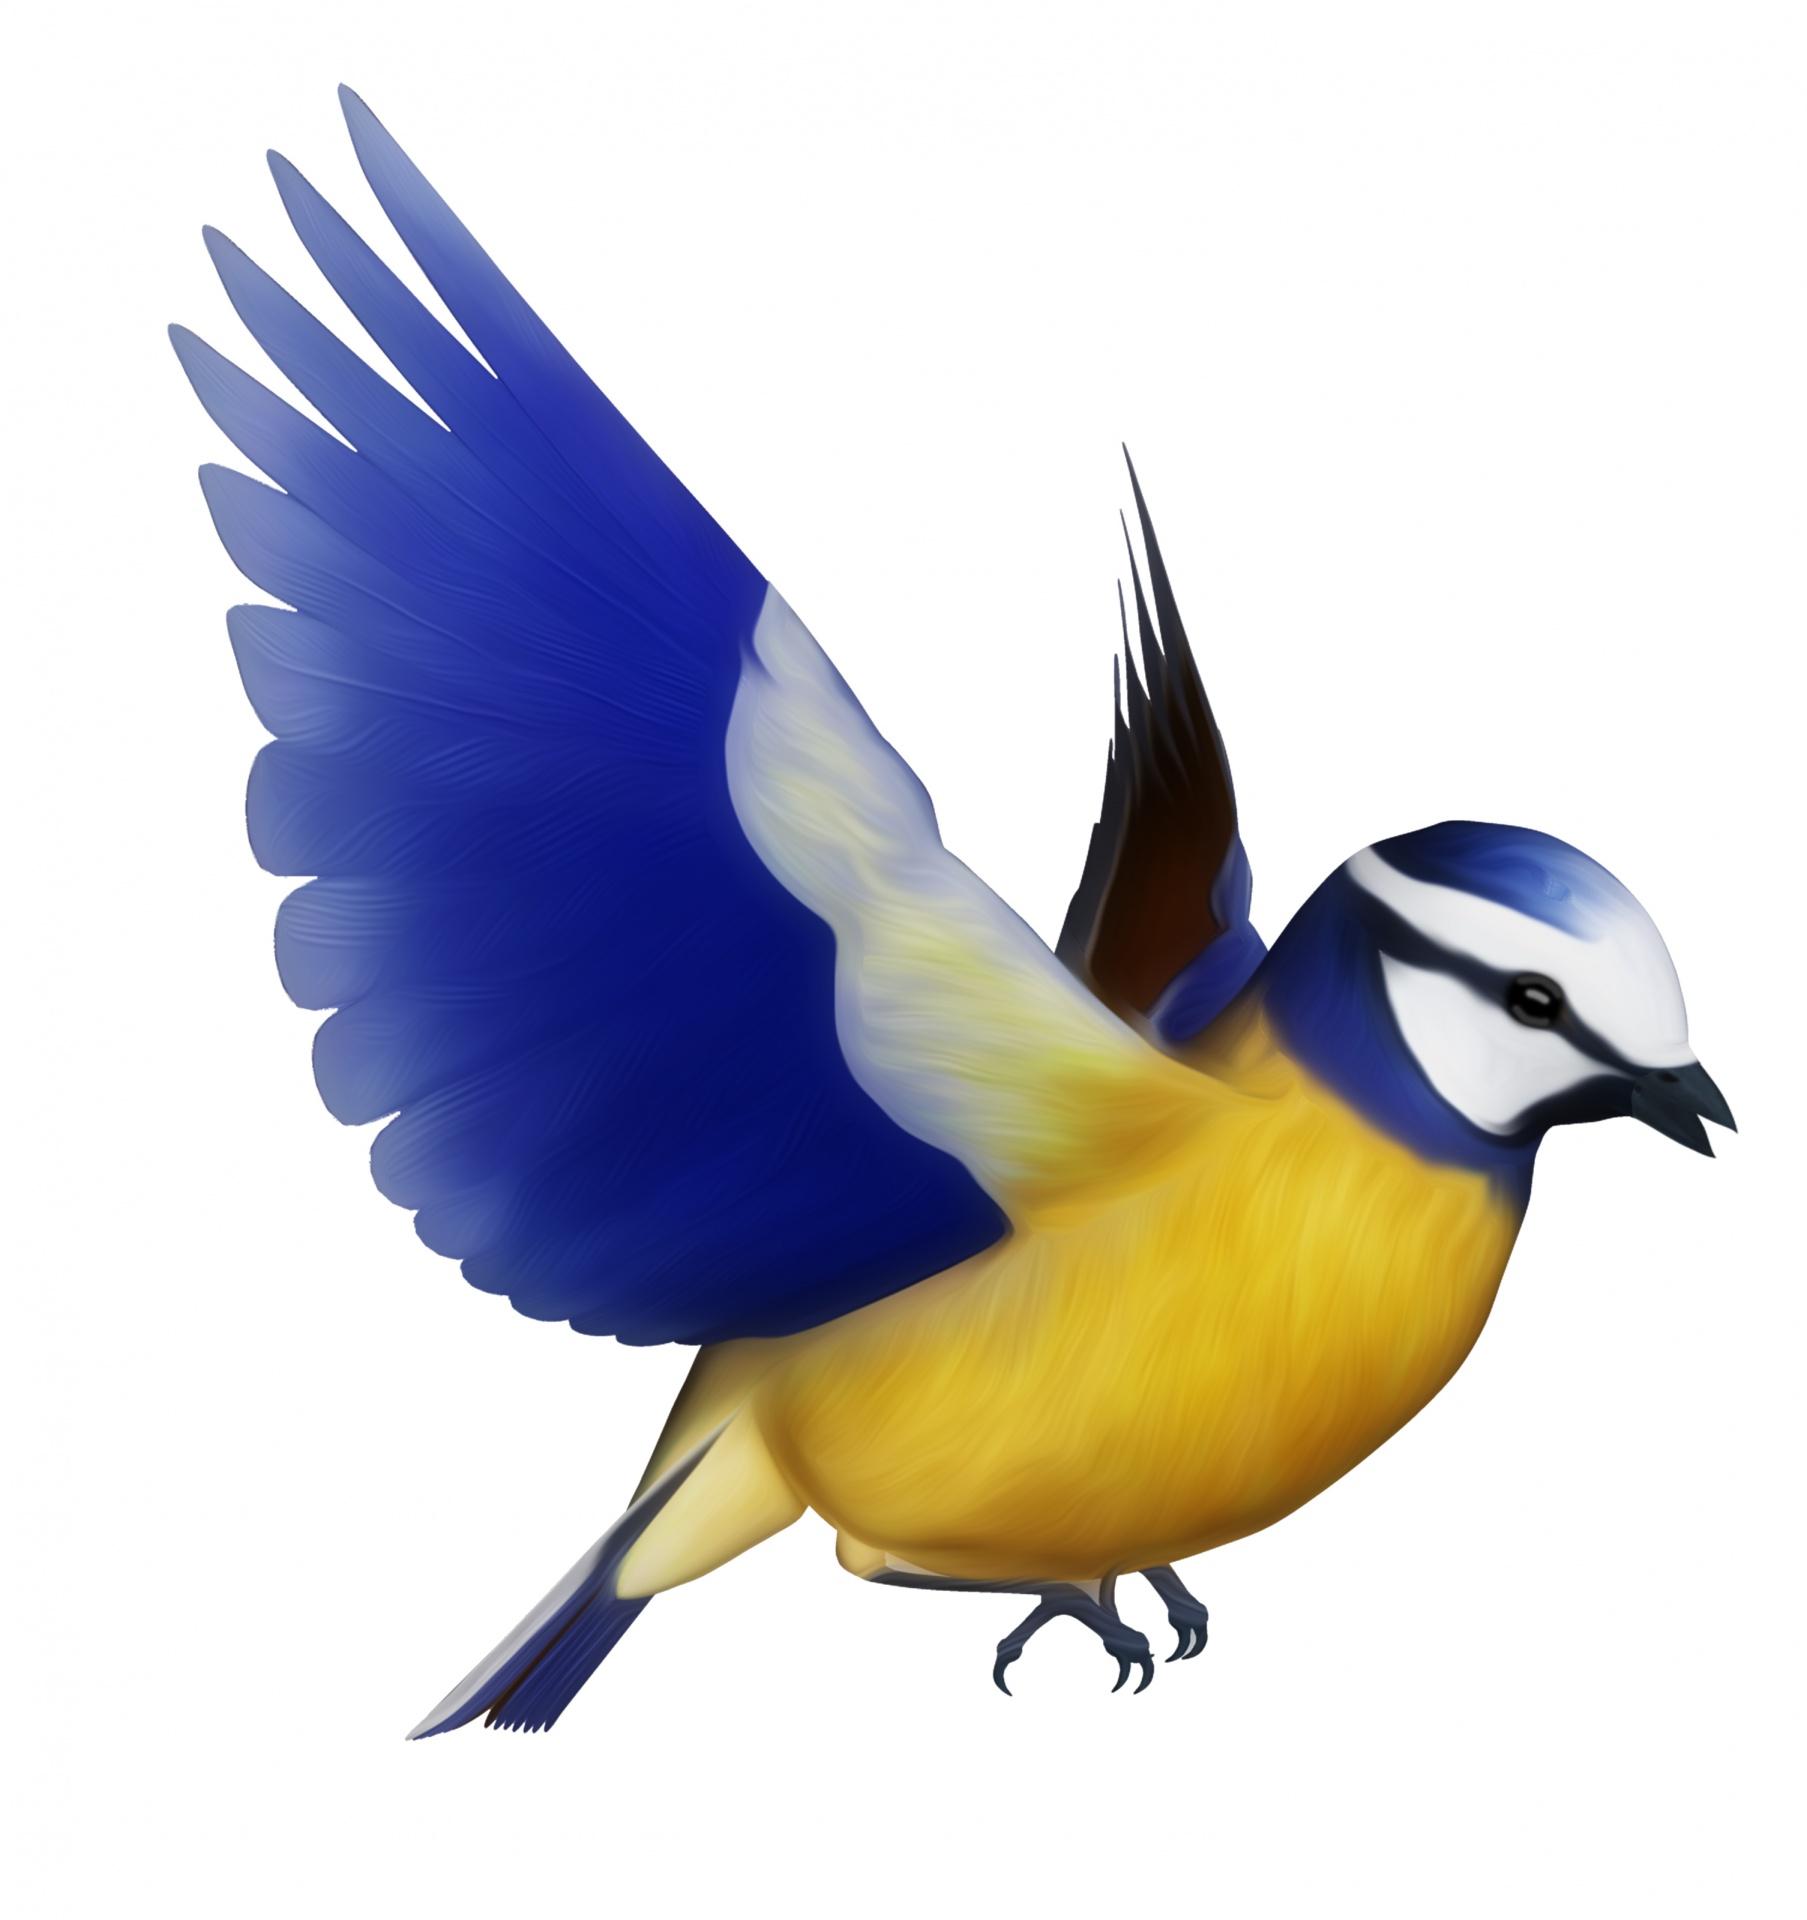 Blue Tit Bird Clipart Free Stock Photo - Public Domain Pictures